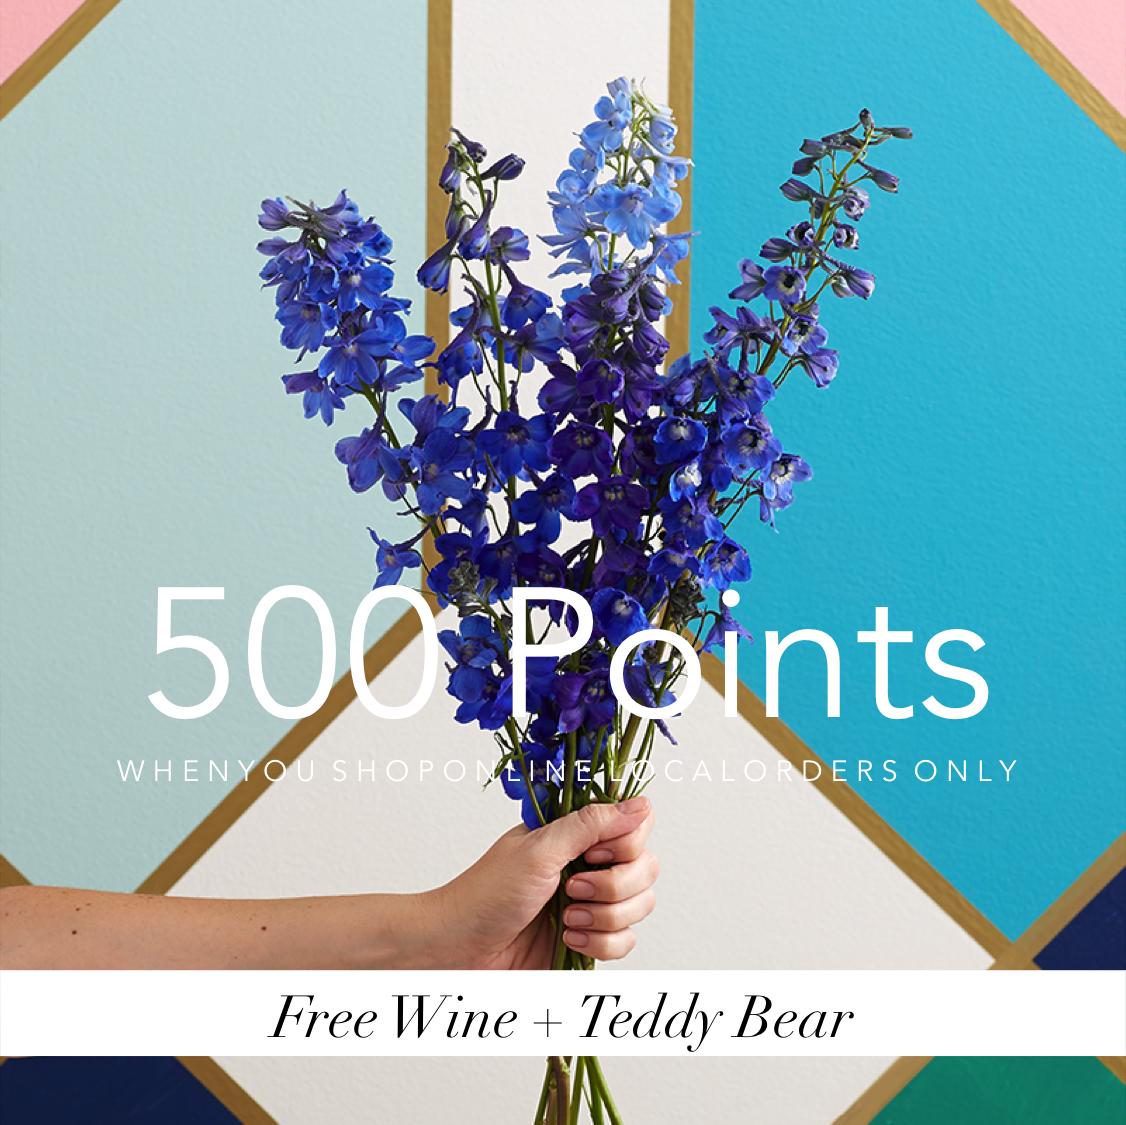 reward-points-2-angie-s-floral-designs-el-paso-florist-floreria-el-paso-angie-s-floral-designs-shop-flowers-online-el-paso-delivery-.png